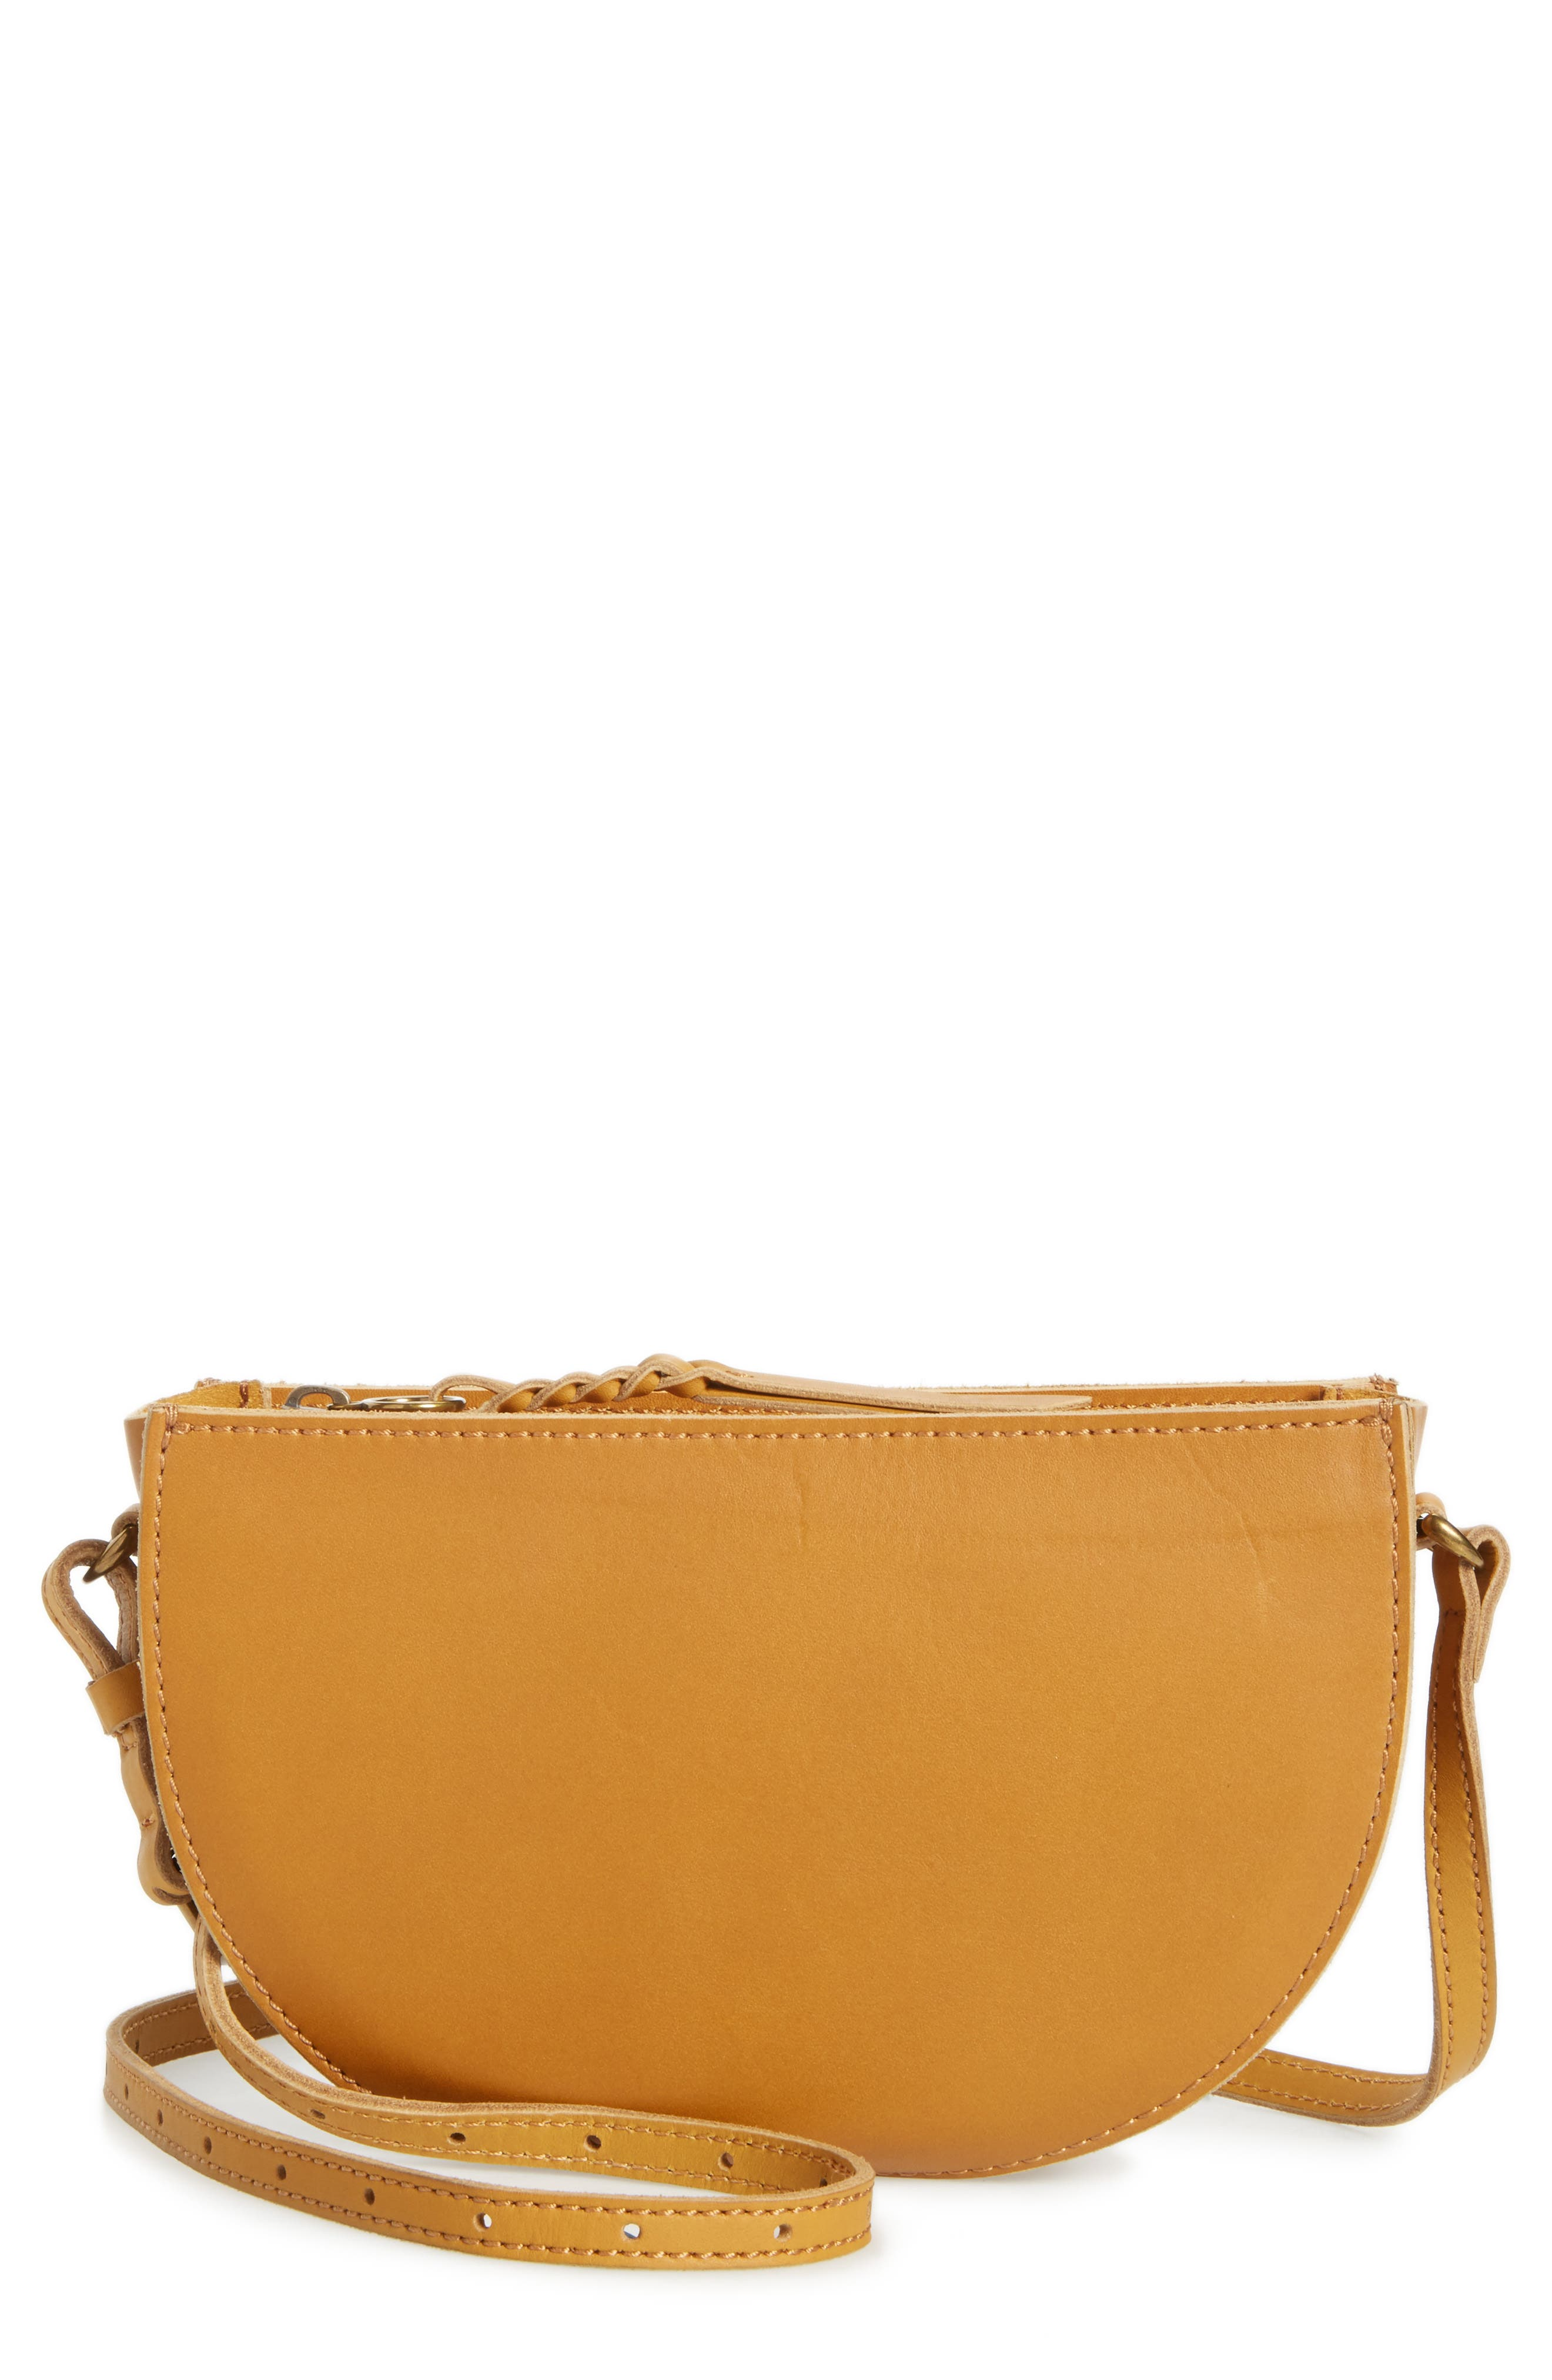 Alternate Image 1 Selected - Madewell Juniper Vachetta Leather Half Moon Crossbody Bag